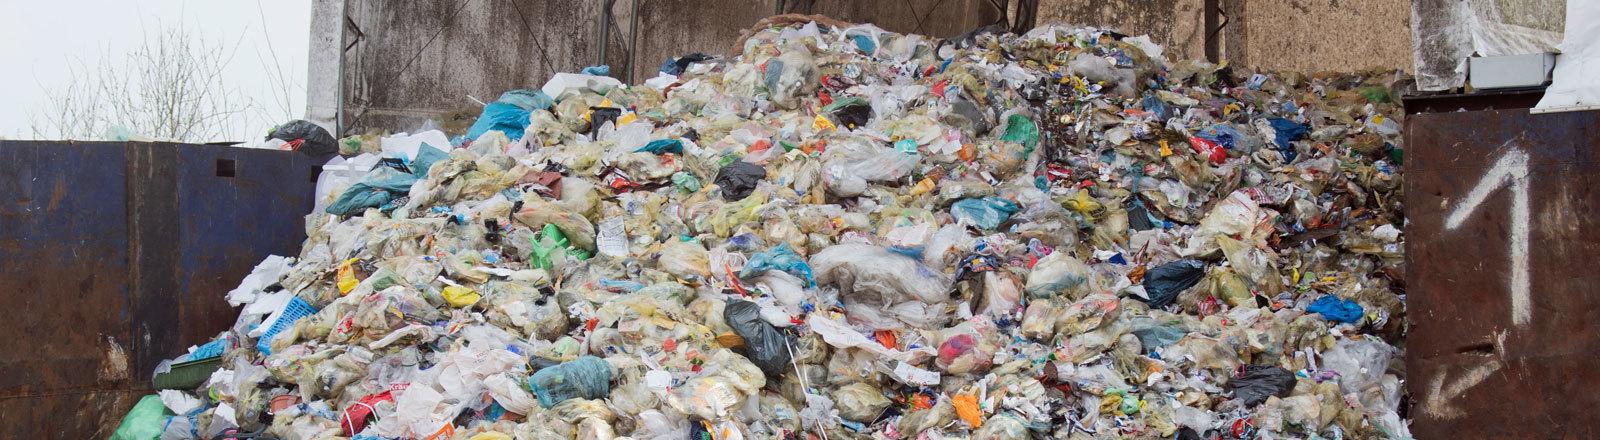 Ein Berg voll Verpackungsmüll – größtenteils Plastikmüll.